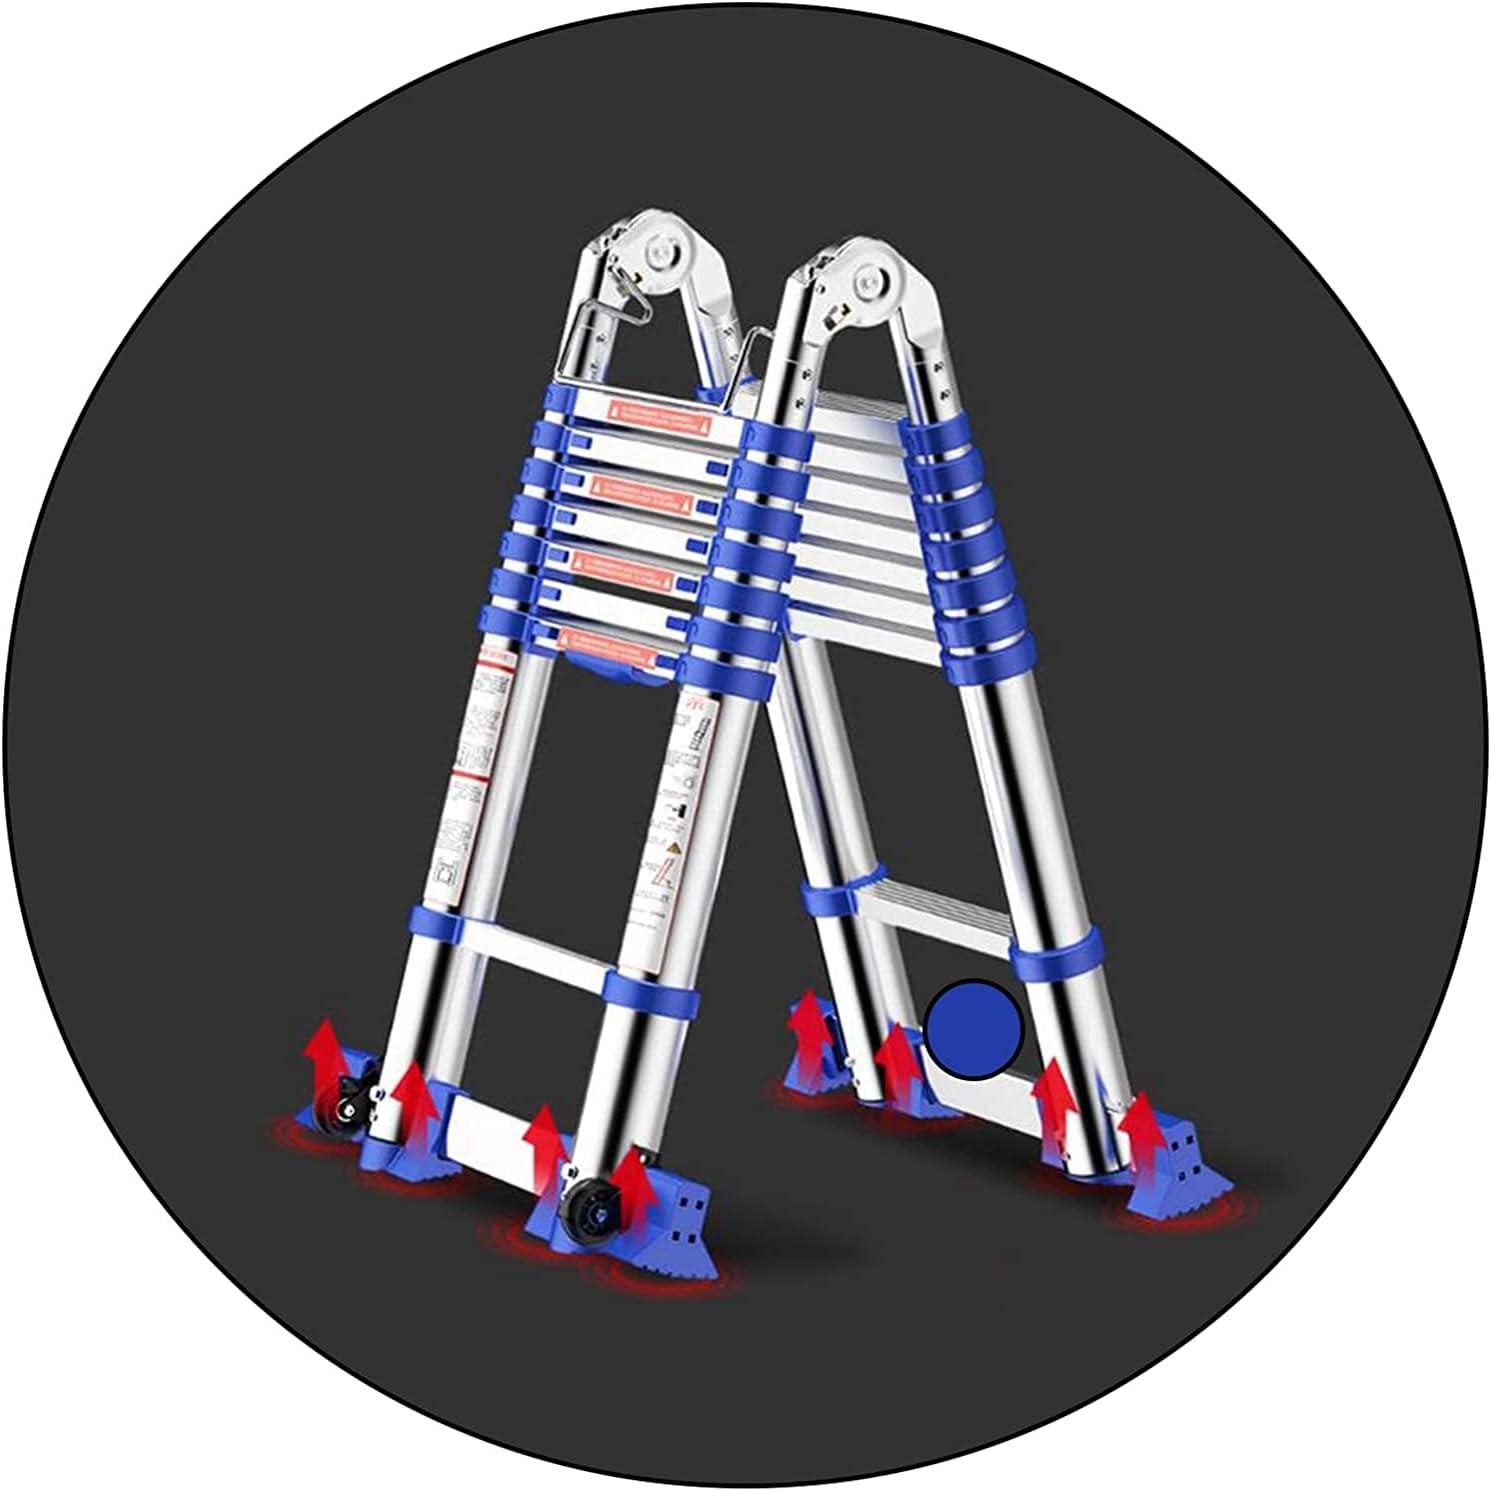 HBSC Telescopic Ladder Aluminum Philadelphia Mall Folding Alloy Extendabl Portable All stores are sold